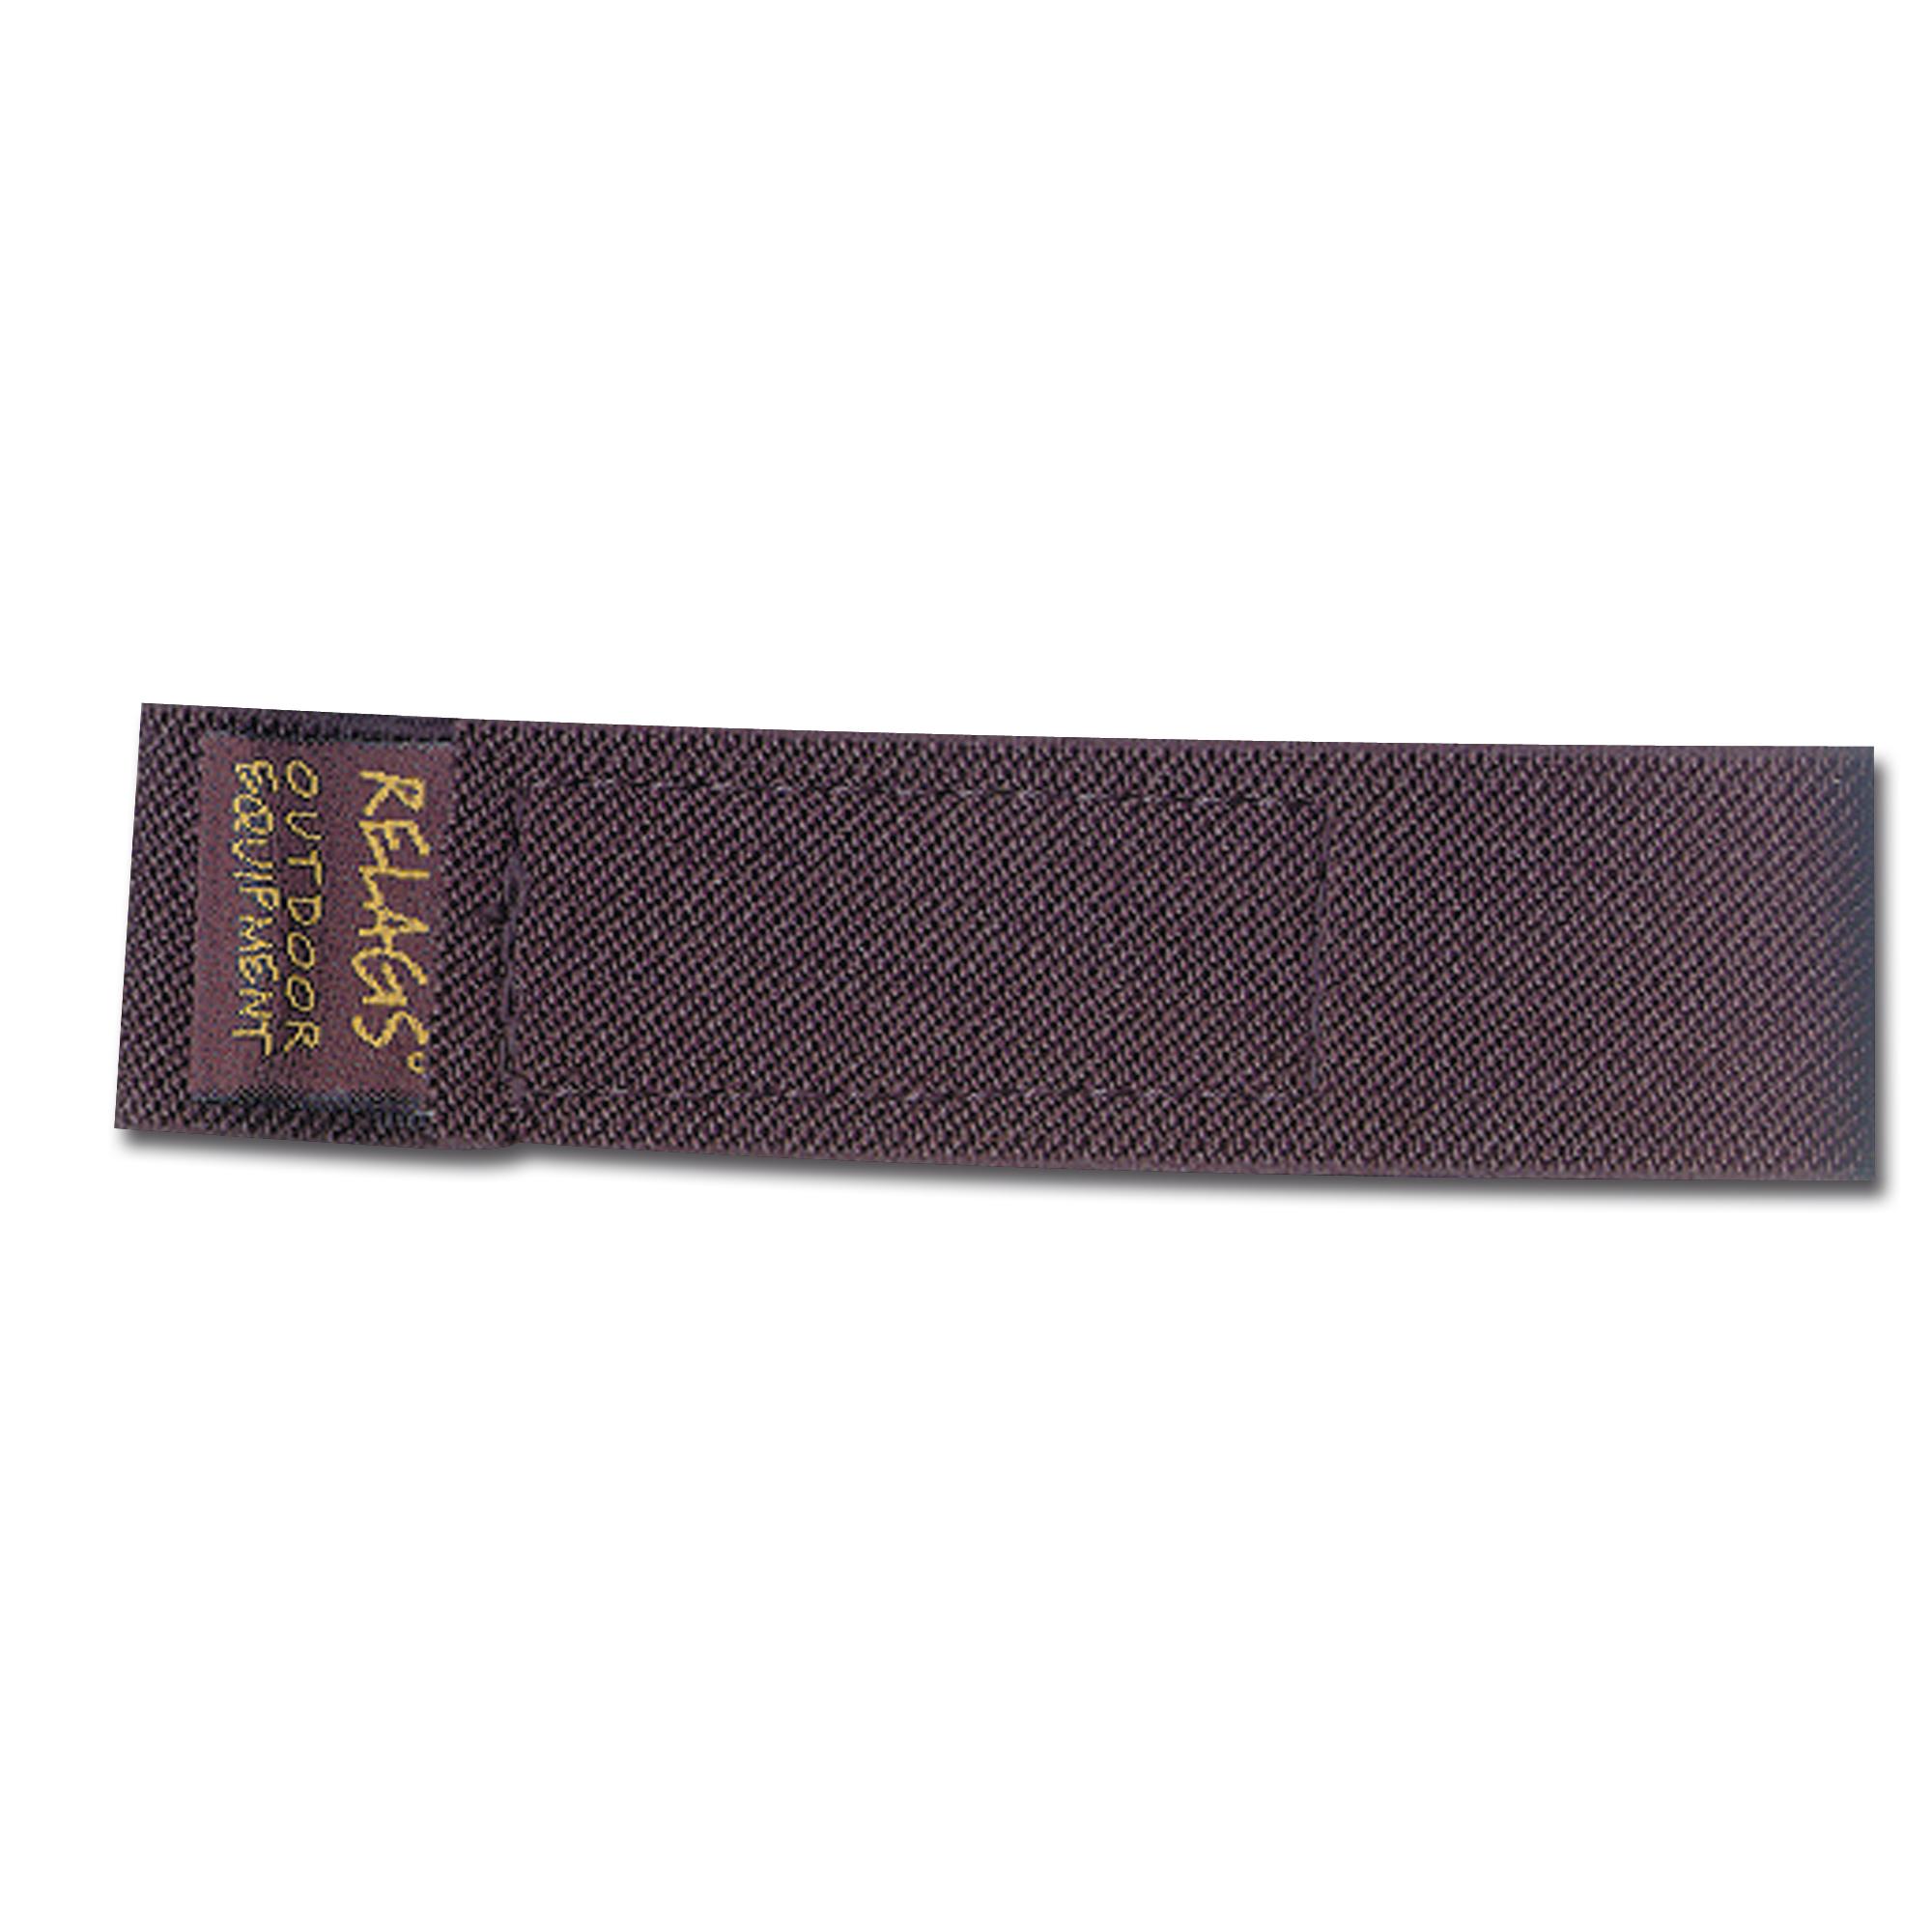 Banda Strapits negra 40 cm